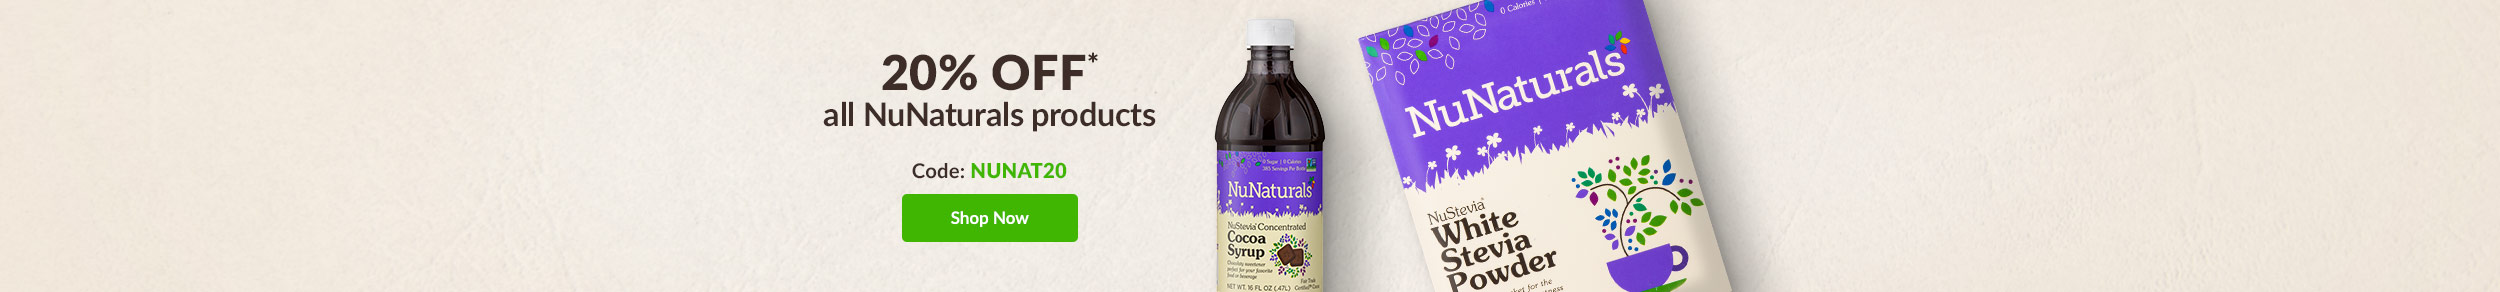 https://i3.pureformulas.net/images/static/NuNaturals_Food_Store_062920.jpg